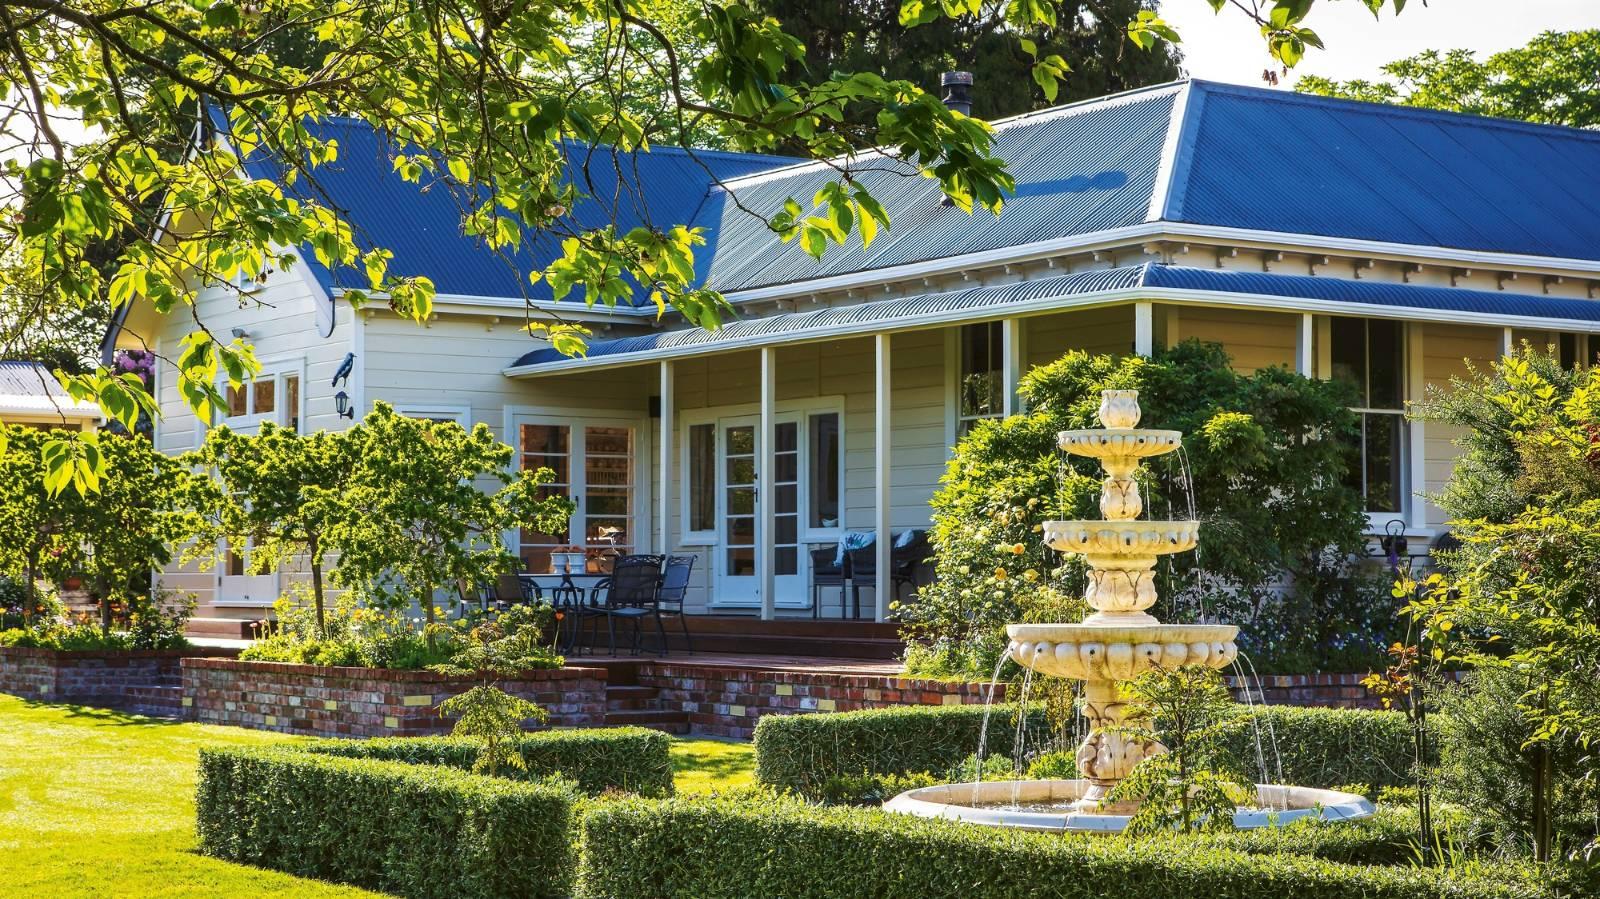 Patchworker's Taranaki garden a layered delight full of nostalgia